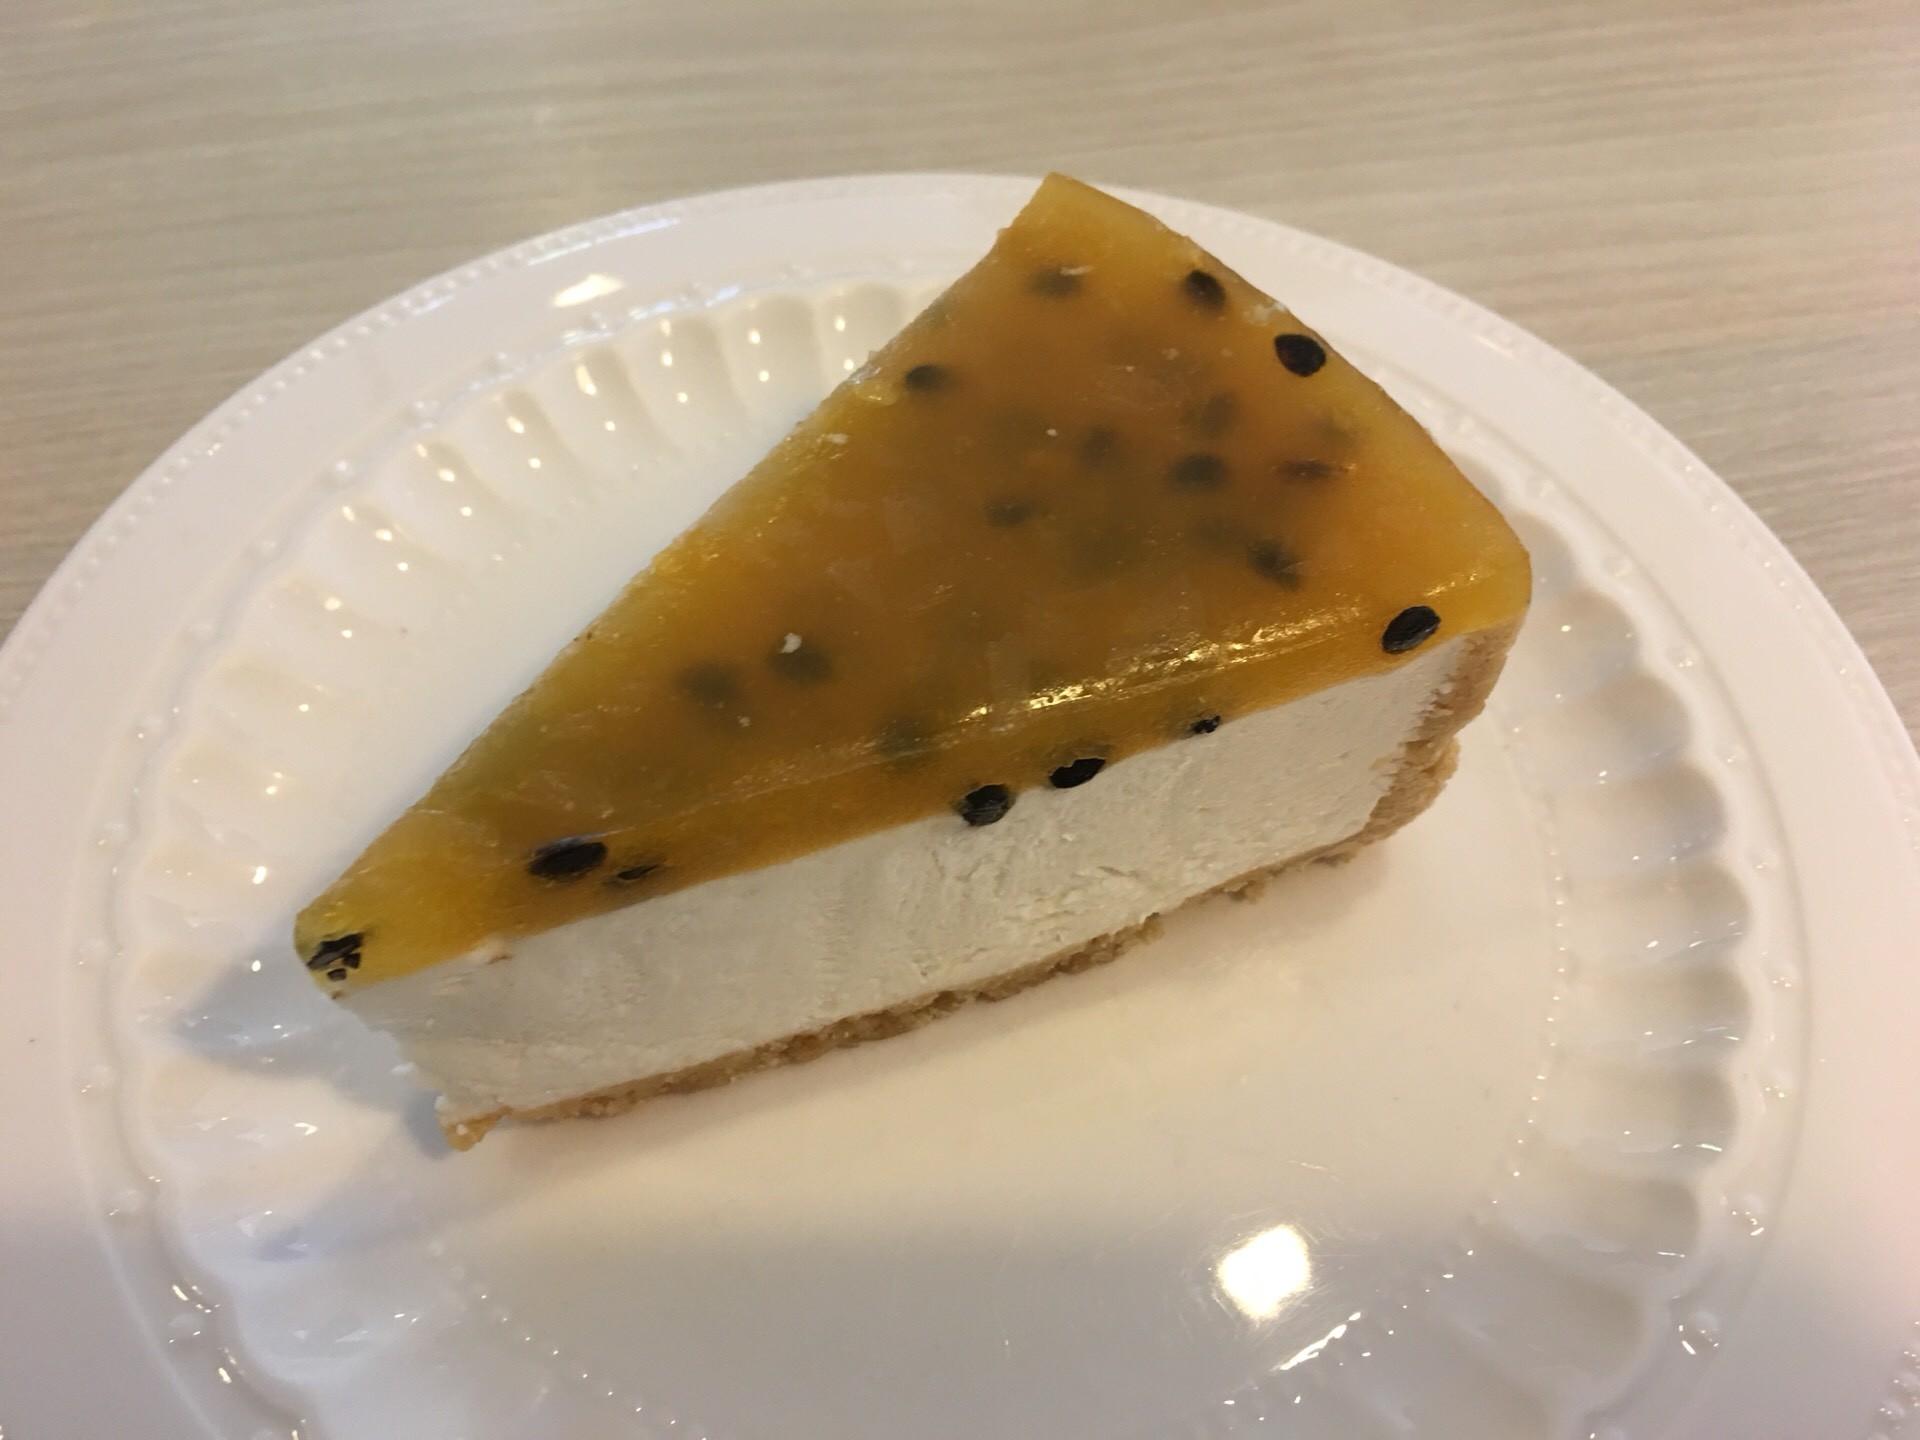 Cheesecake House & Restaurant ทองหล่อ